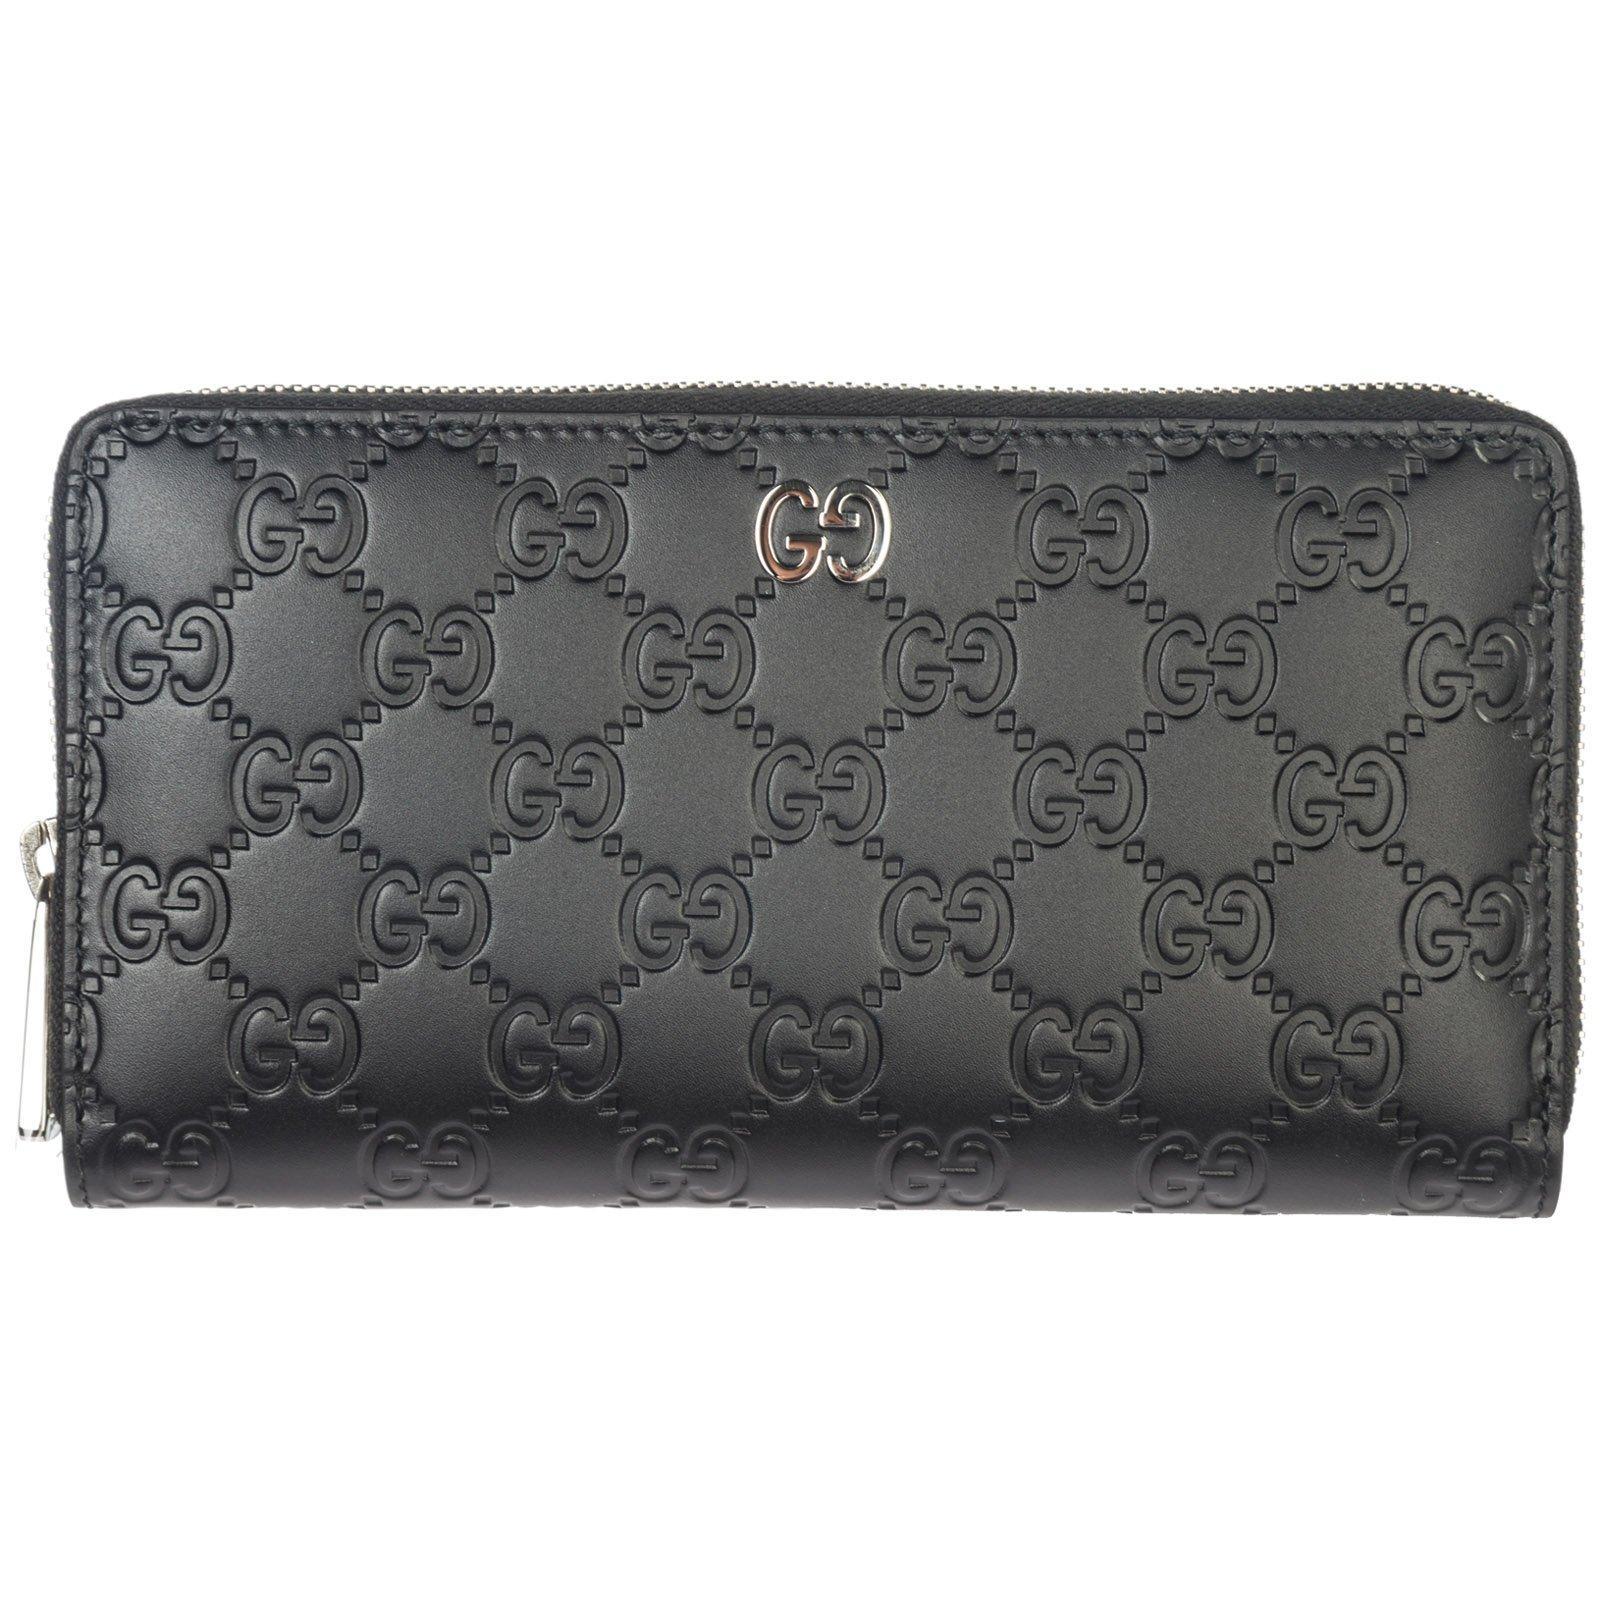 cb2109065 Lyst - Gucci Classic Zip Around Wallet in Black for Men